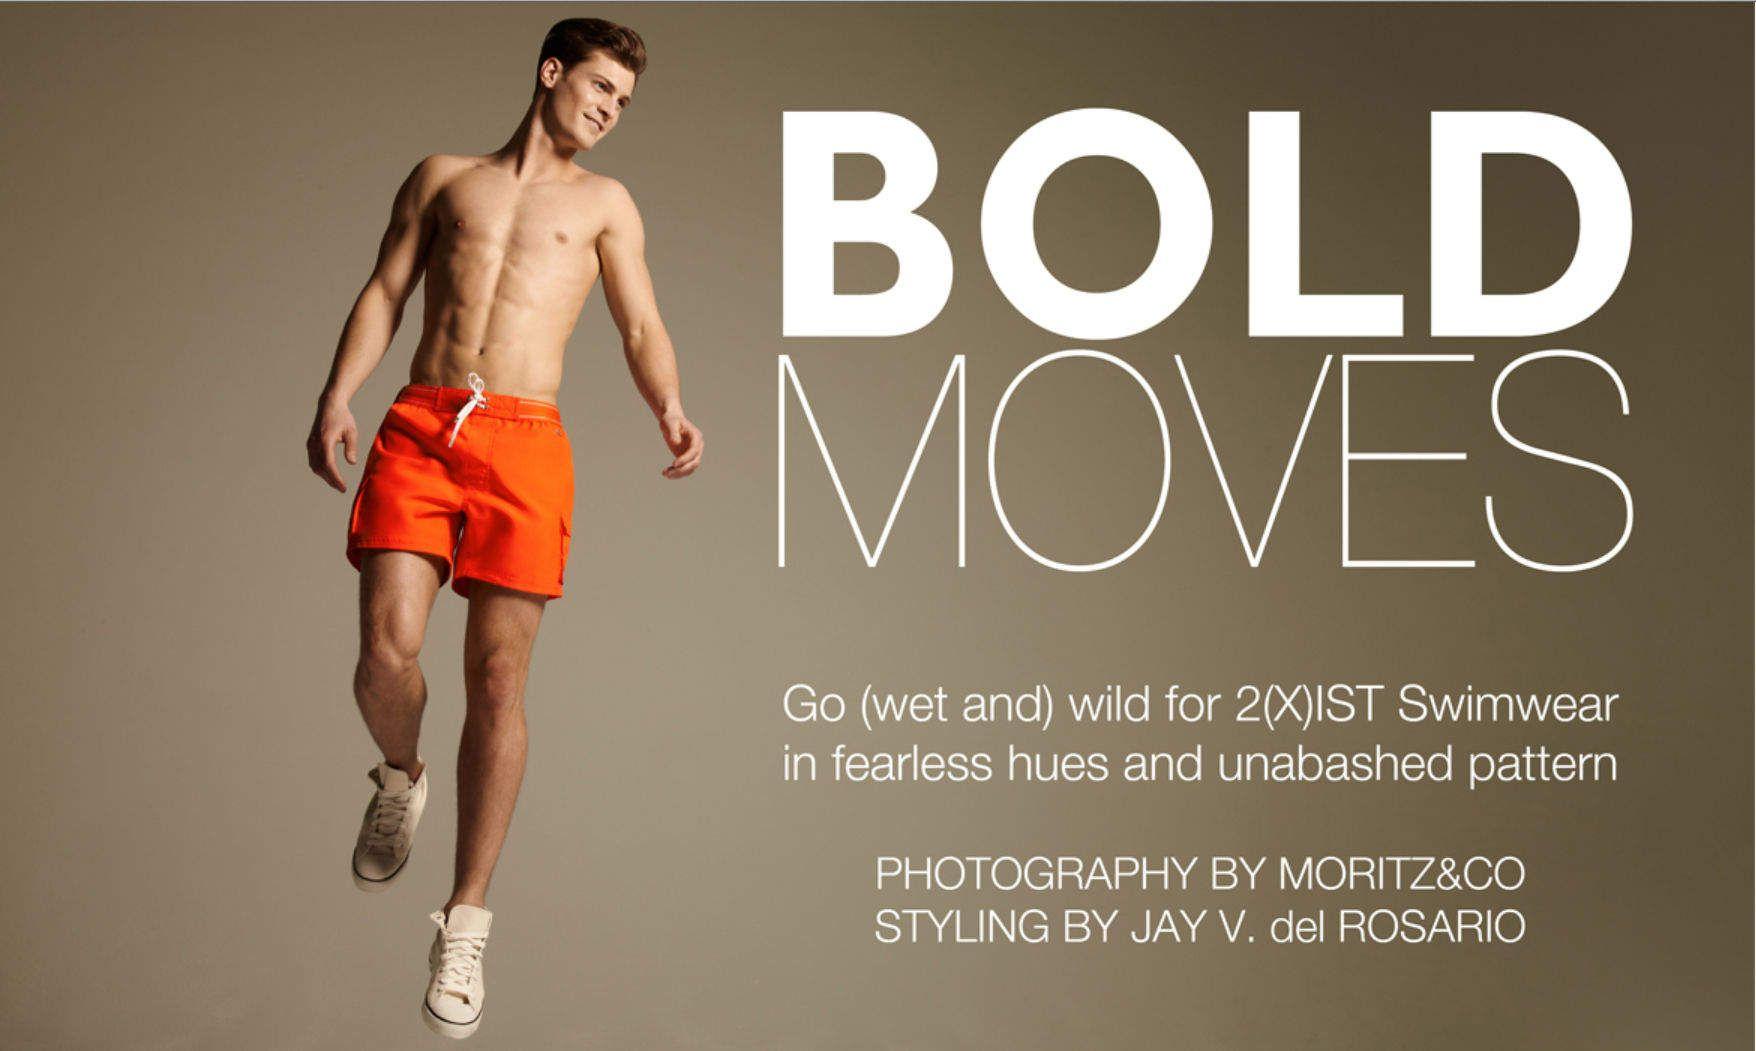 1bold_moves_001.jpg